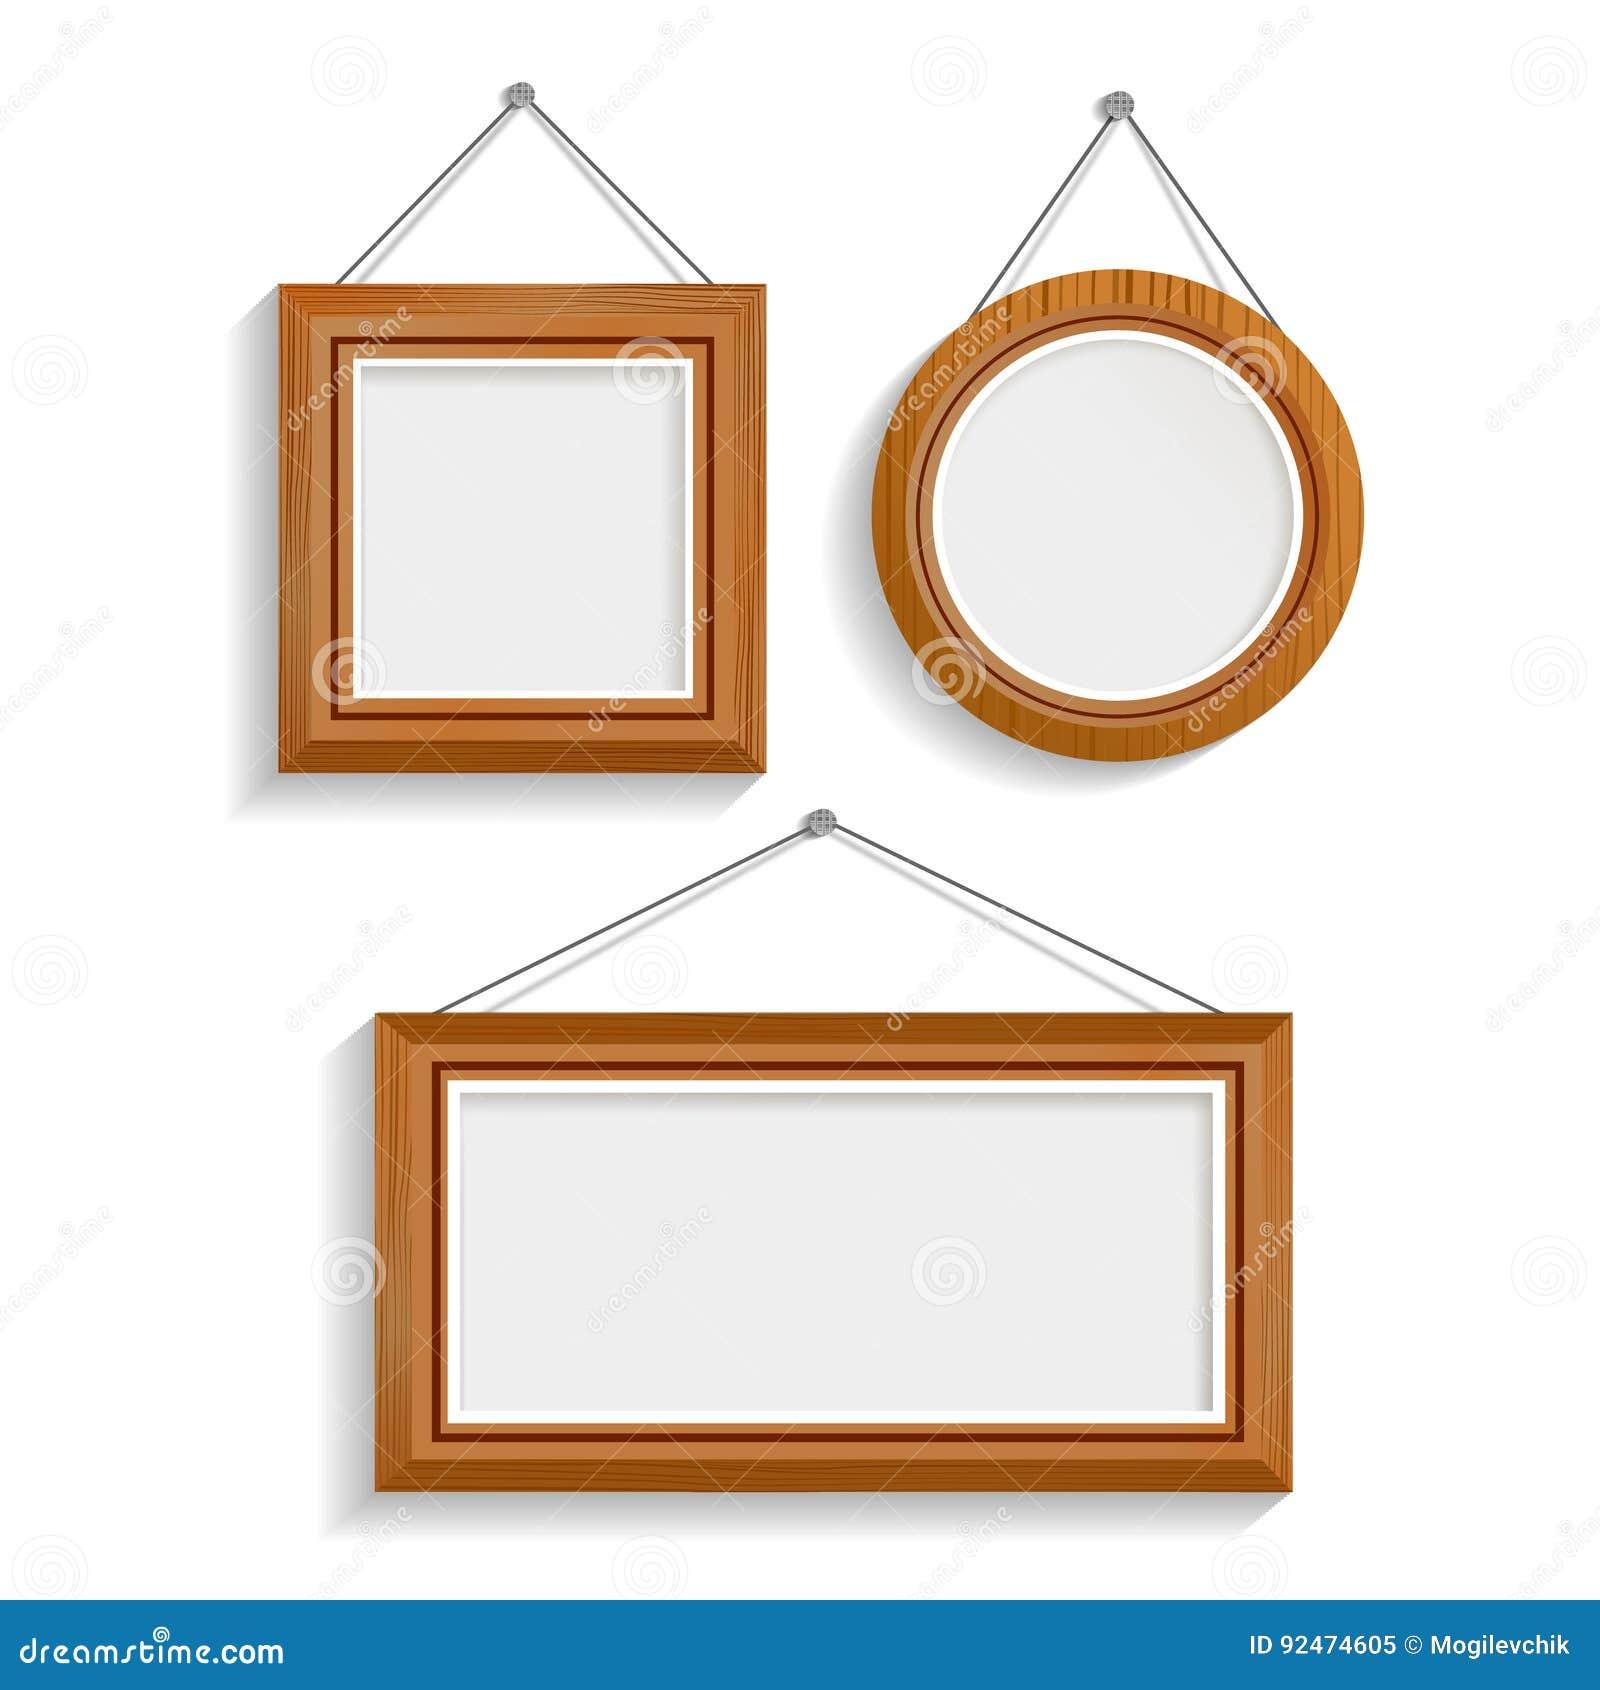 Wood frames set free vector - Dark Wood Isolated Frames Set Stock Vector